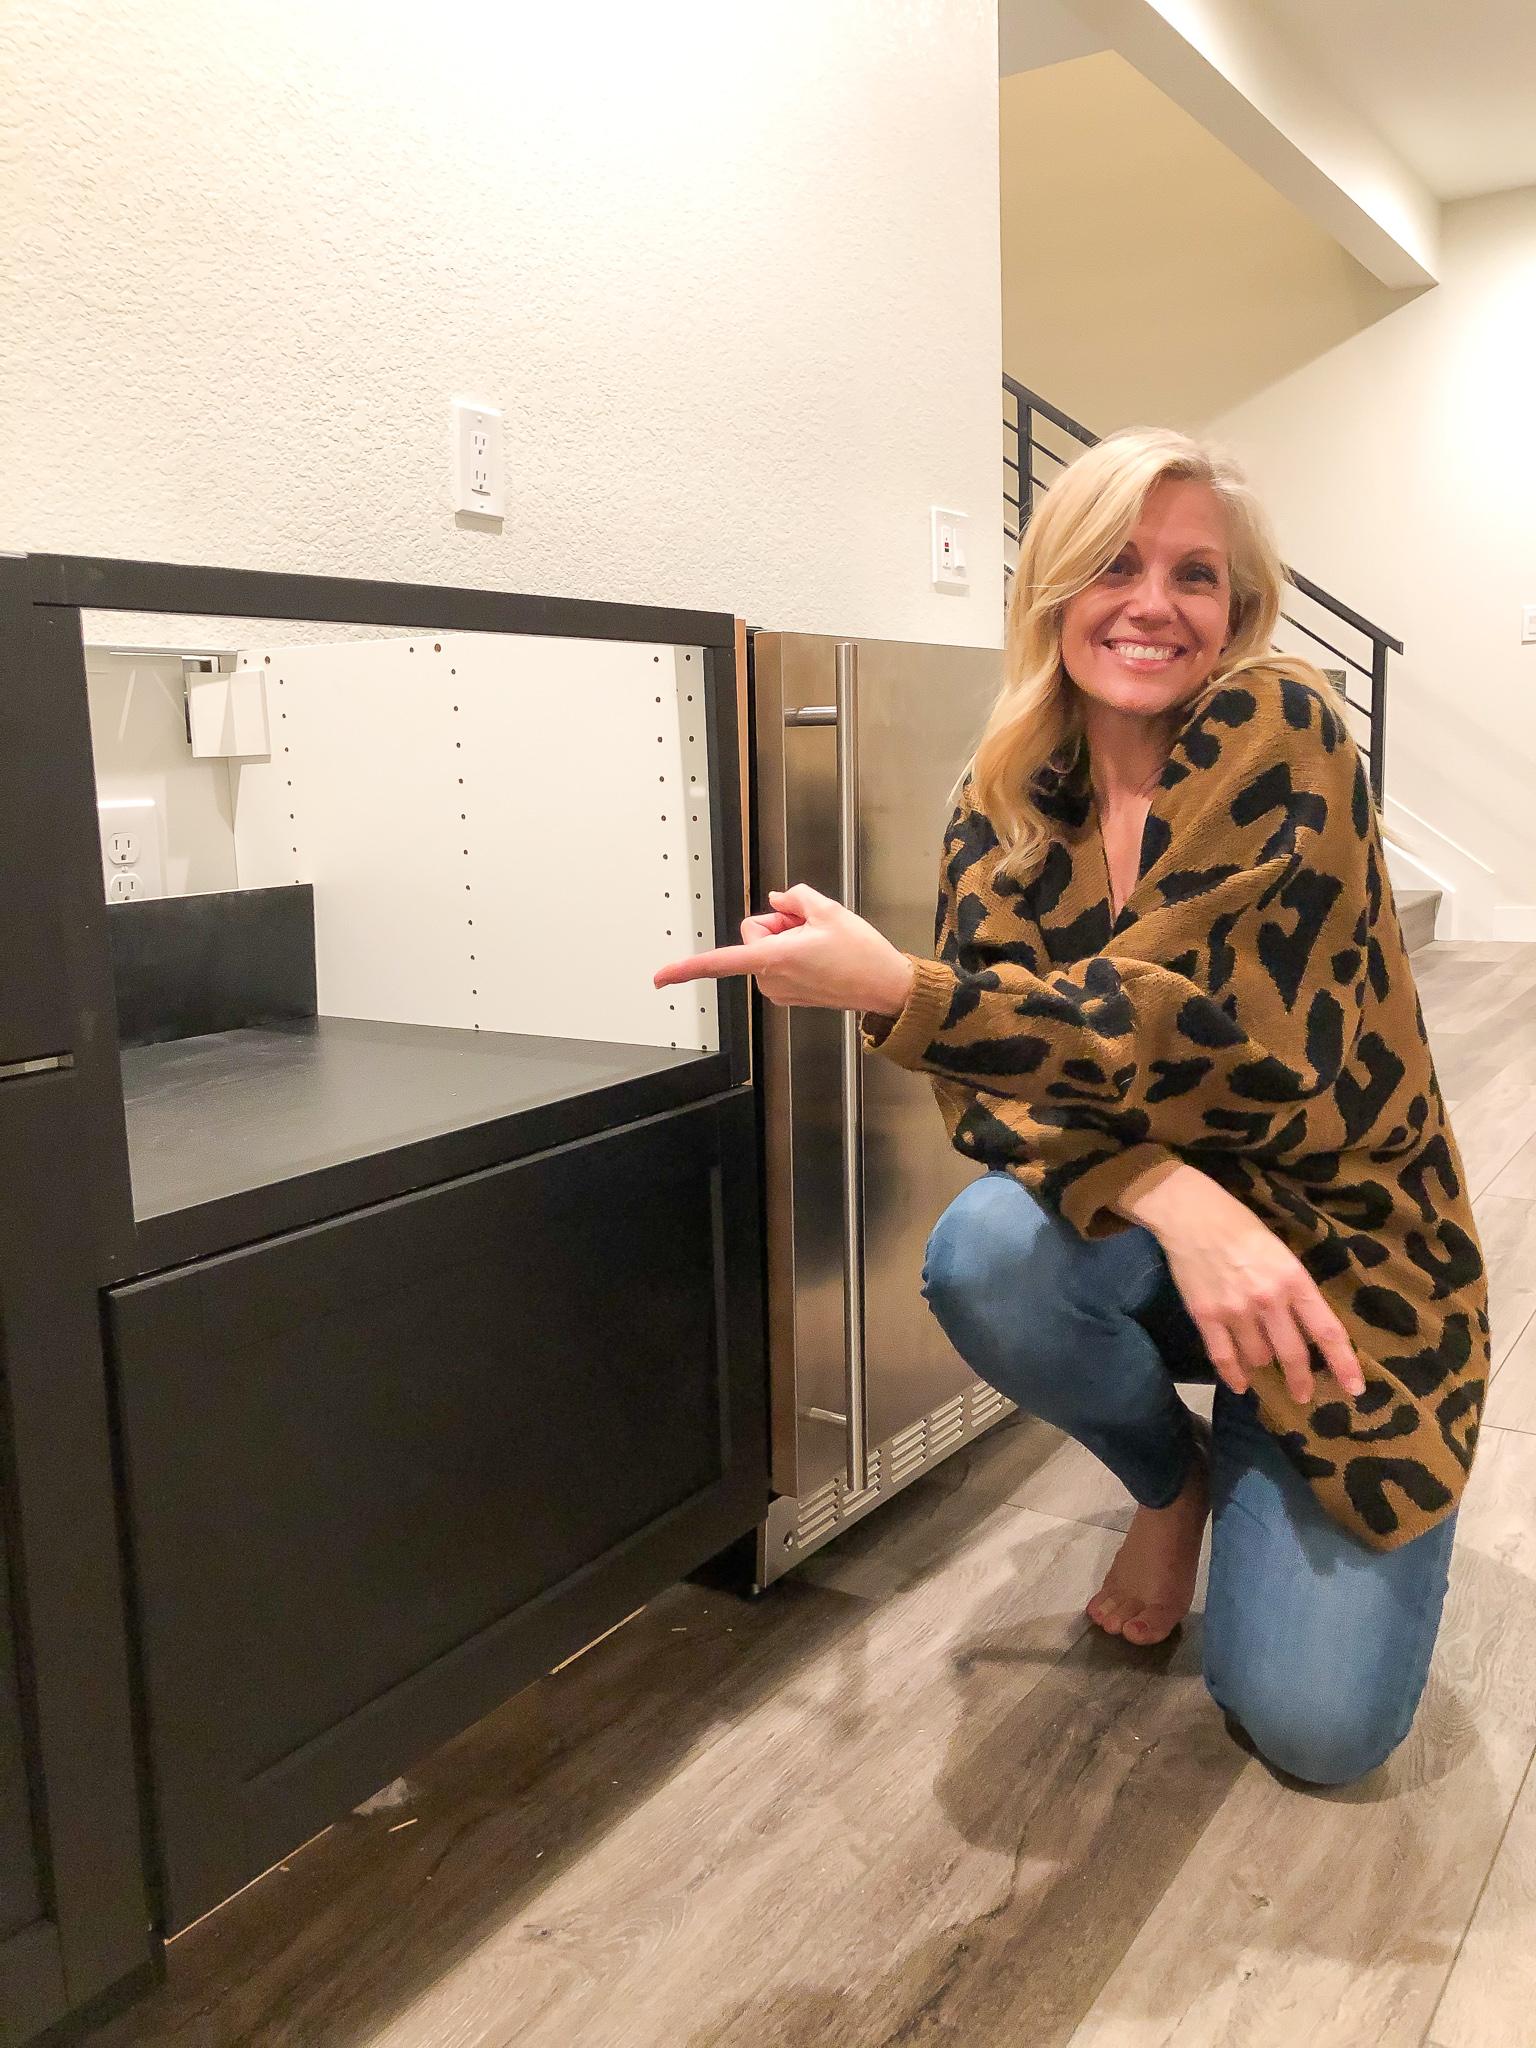 Ikea Hack - Microwave Cabinet